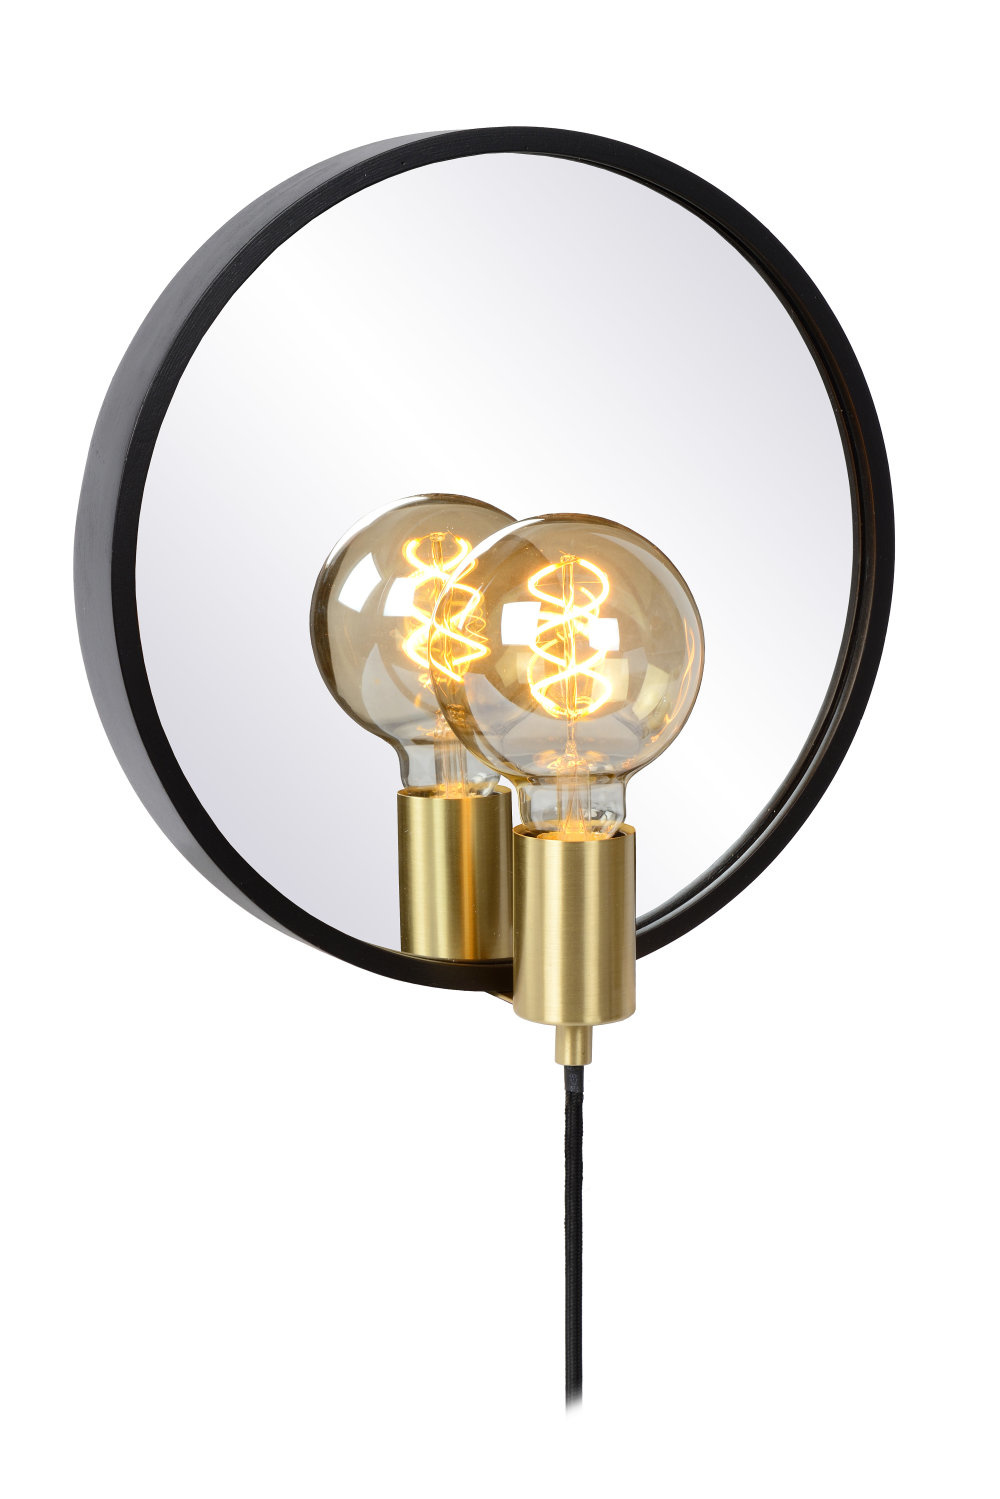 Lucide REFLEX Spiegellamp-Zwart-1xE27-25W-Hout